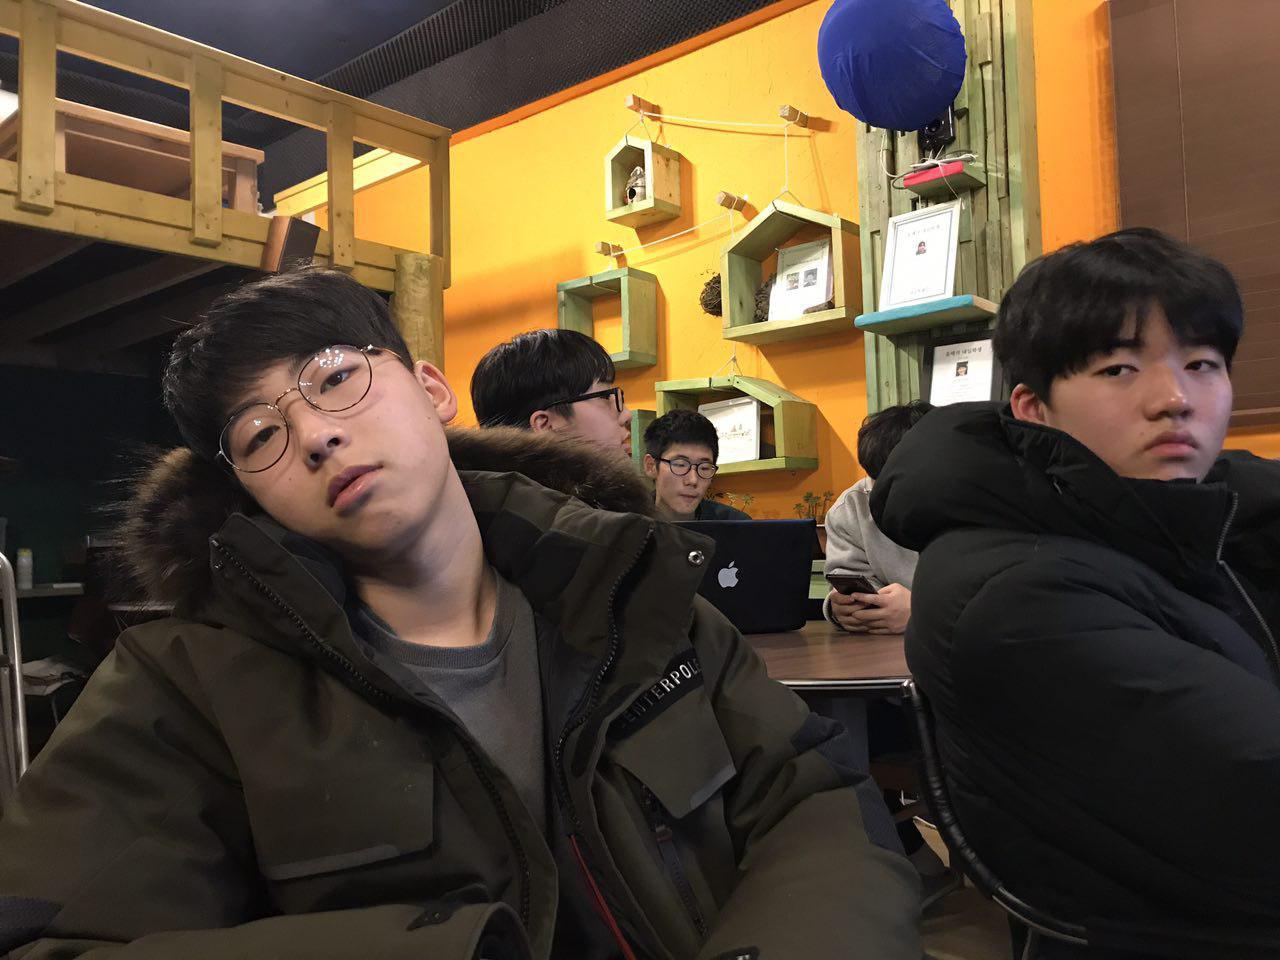 photo_2018-01-12_17-50-06.jpg